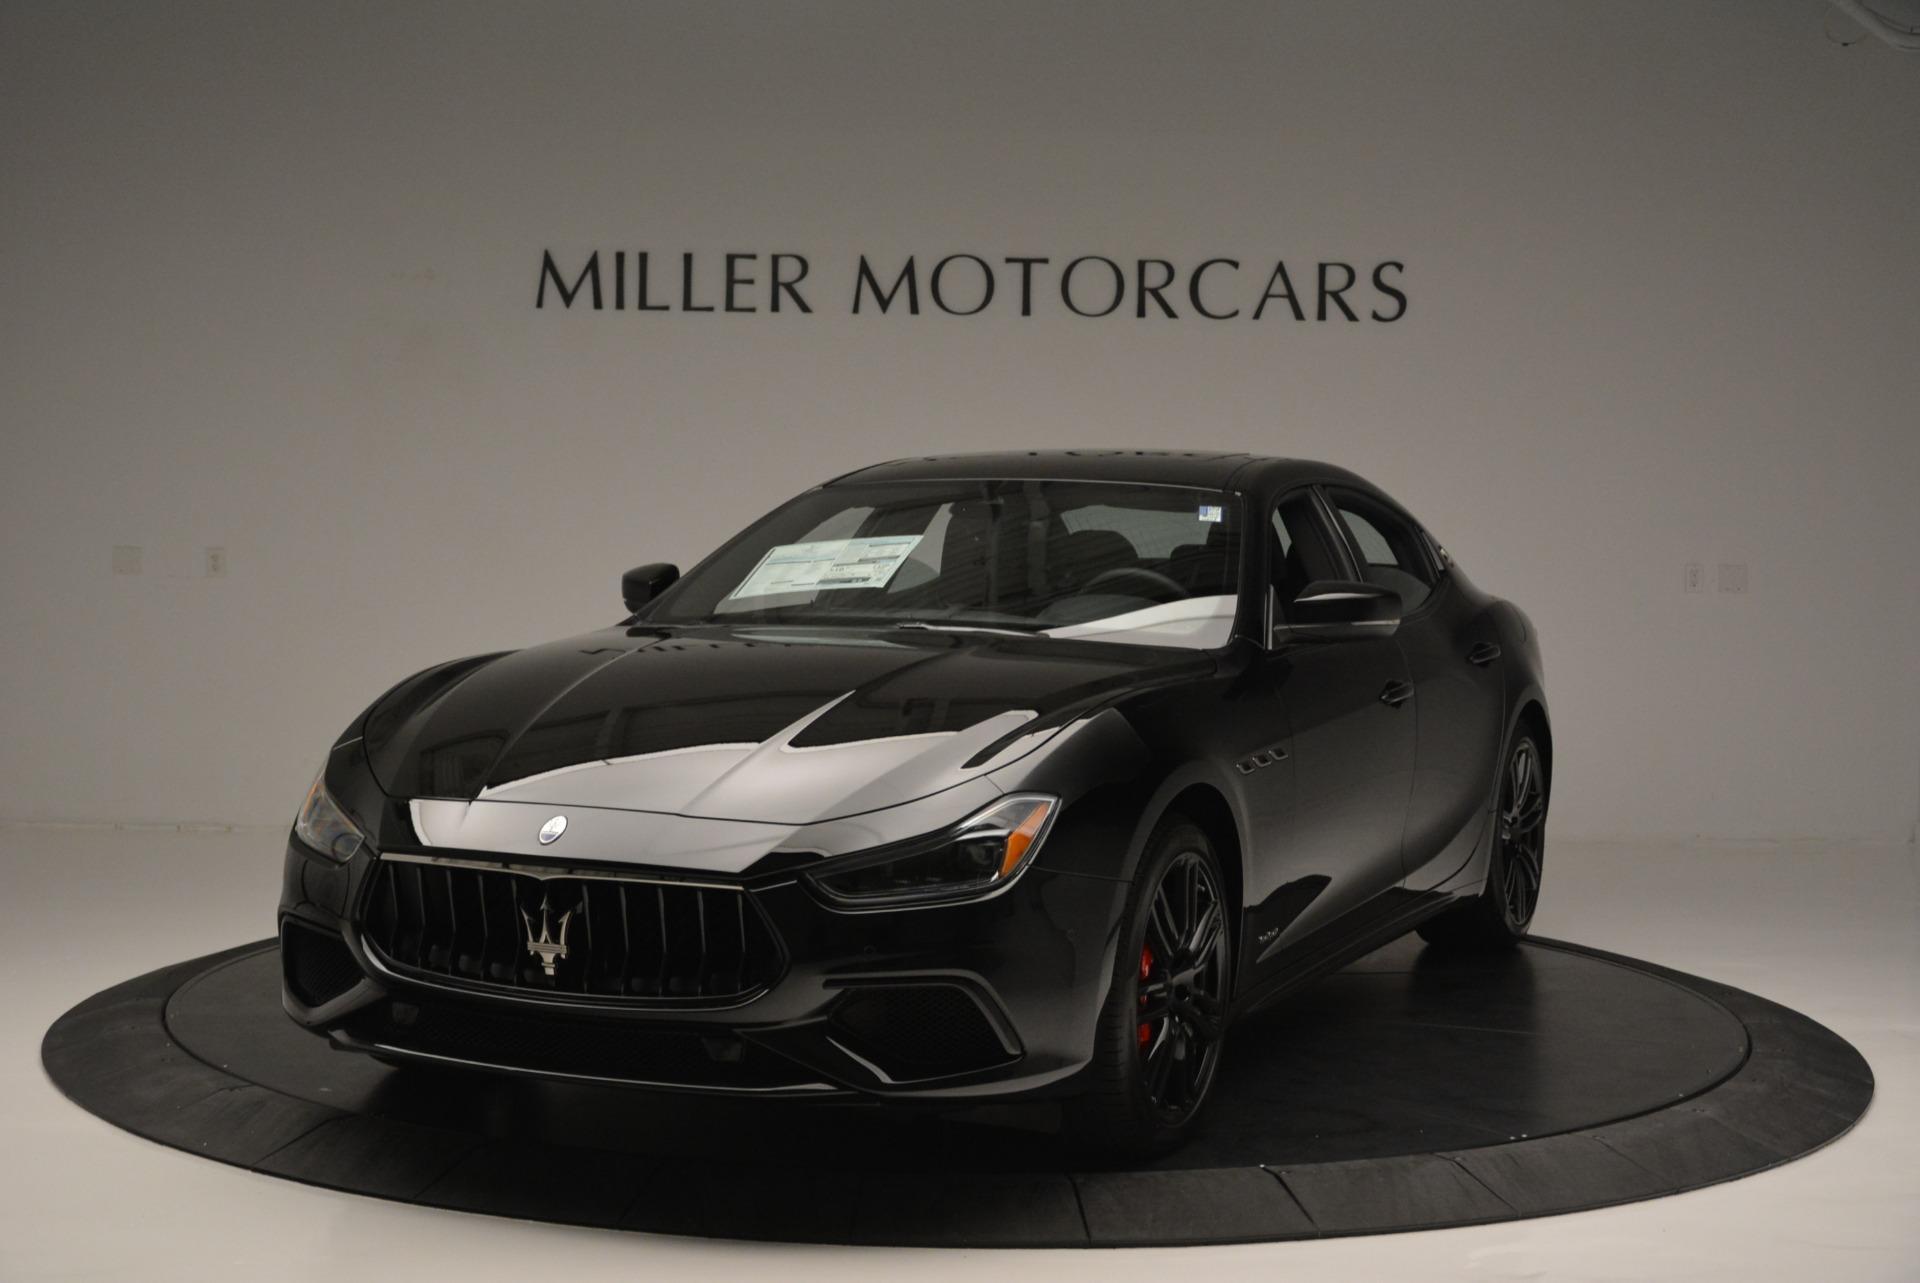 New 2018 Maserati Ghibli SQ4 GranSport Nerissimo For Sale In Westport, CT 2278_main